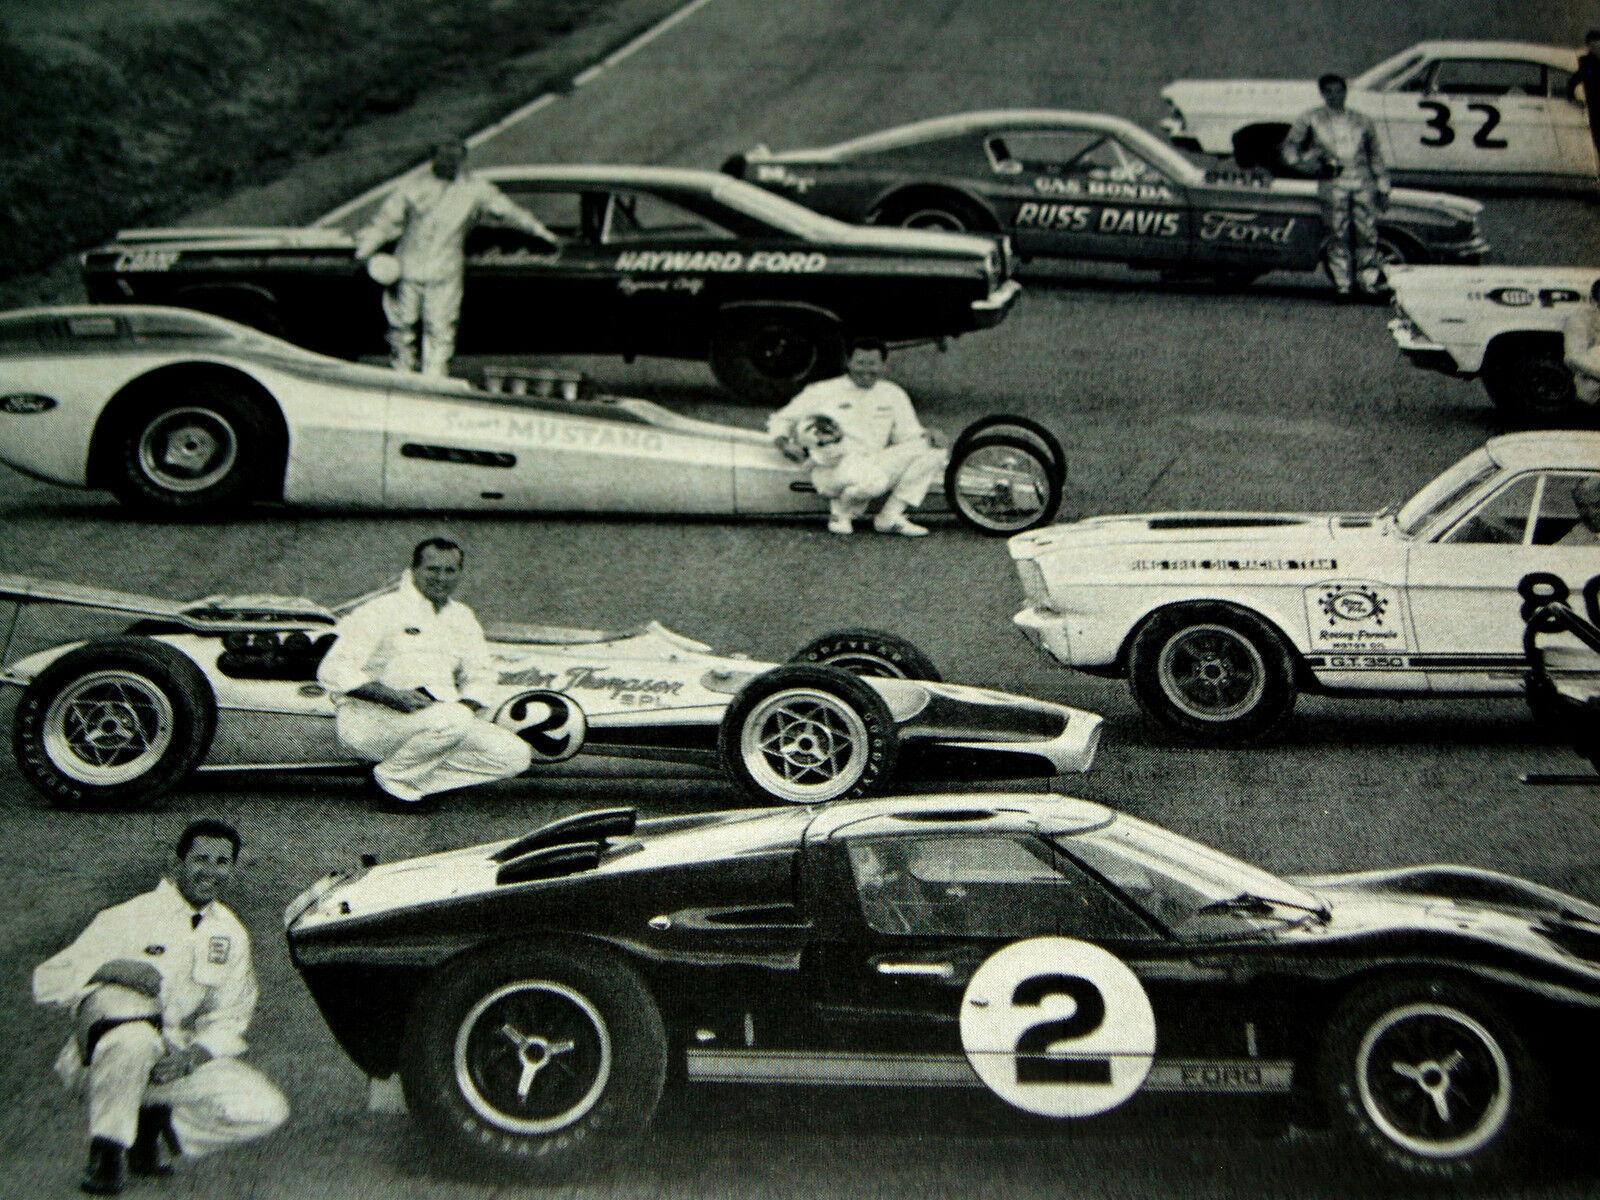 1966 1967 ford shelby cobra 427 289 mustang gt gt500 gt40 350 fairlane race car ebay. Black Bedroom Furniture Sets. Home Design Ideas